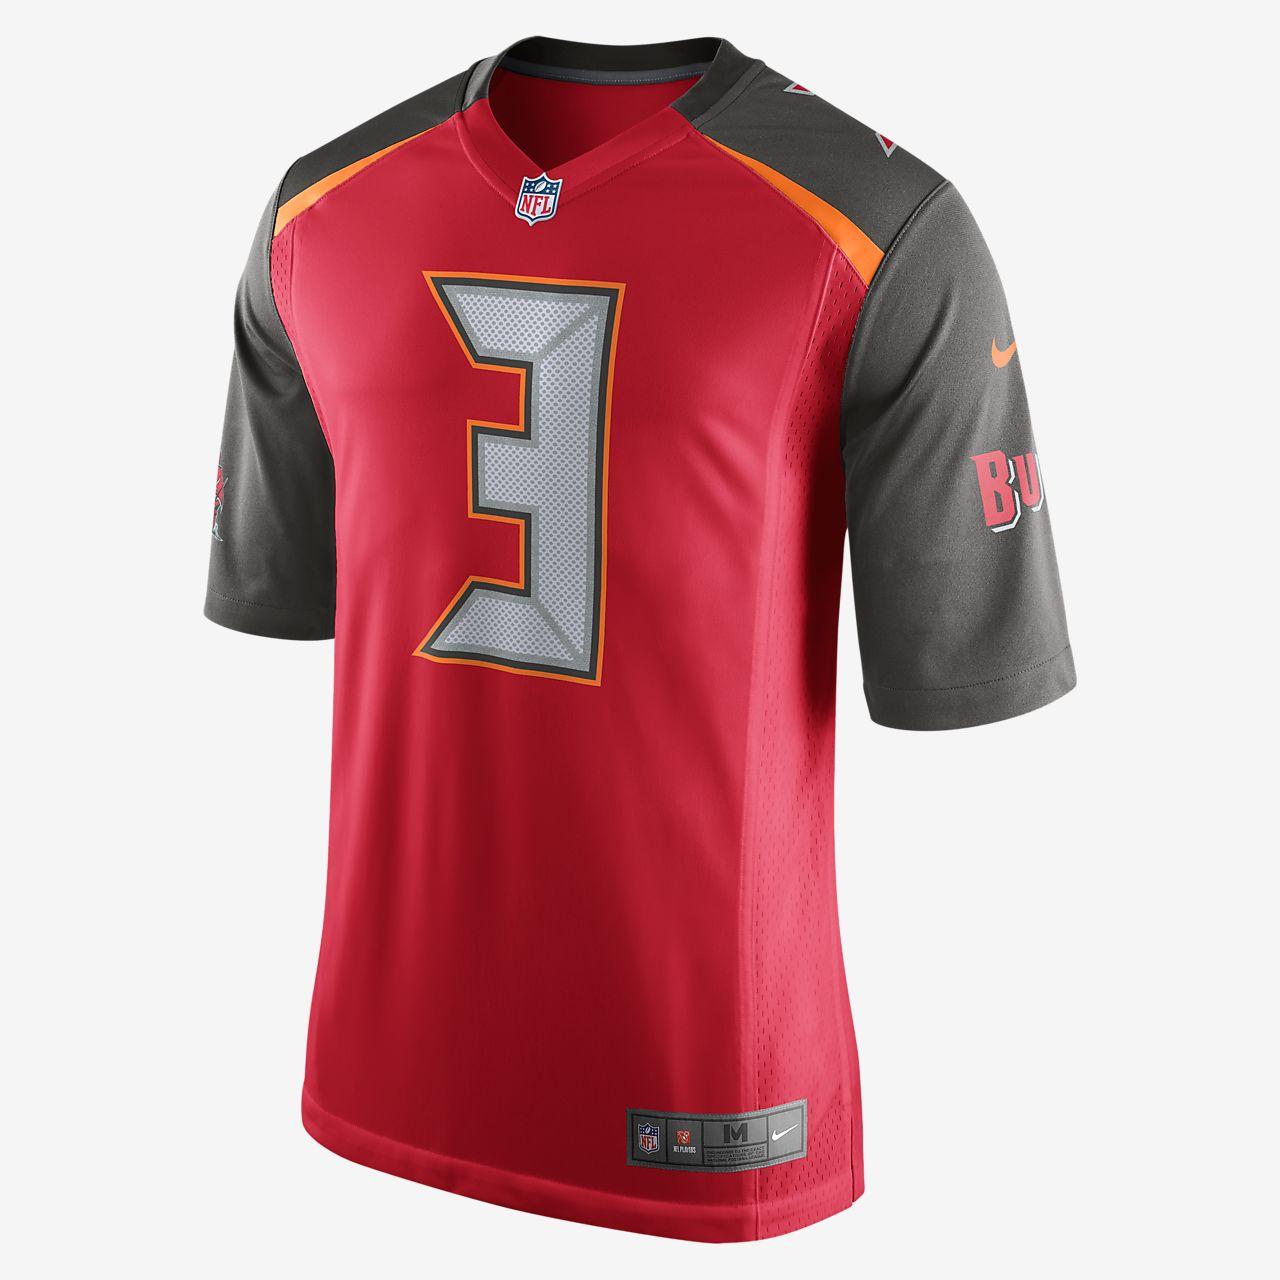 NFL Tampa Bay Buccaneers (Jameis Winston) Men s Football Home Game ... 9d4b4cad9